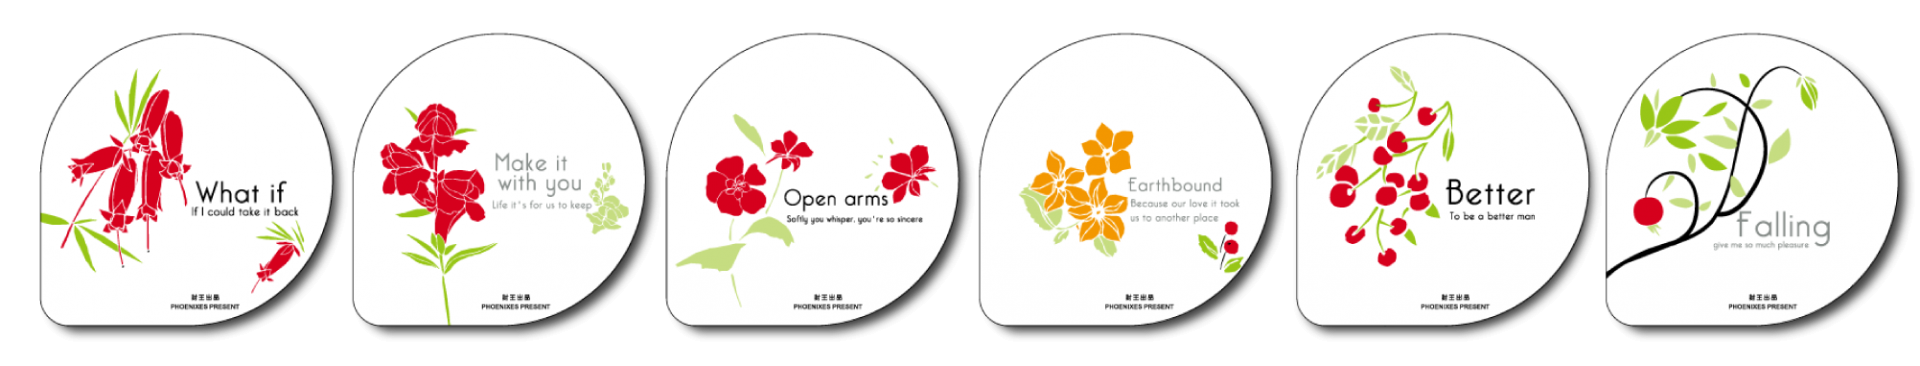 Standardpapierfilm: Blume